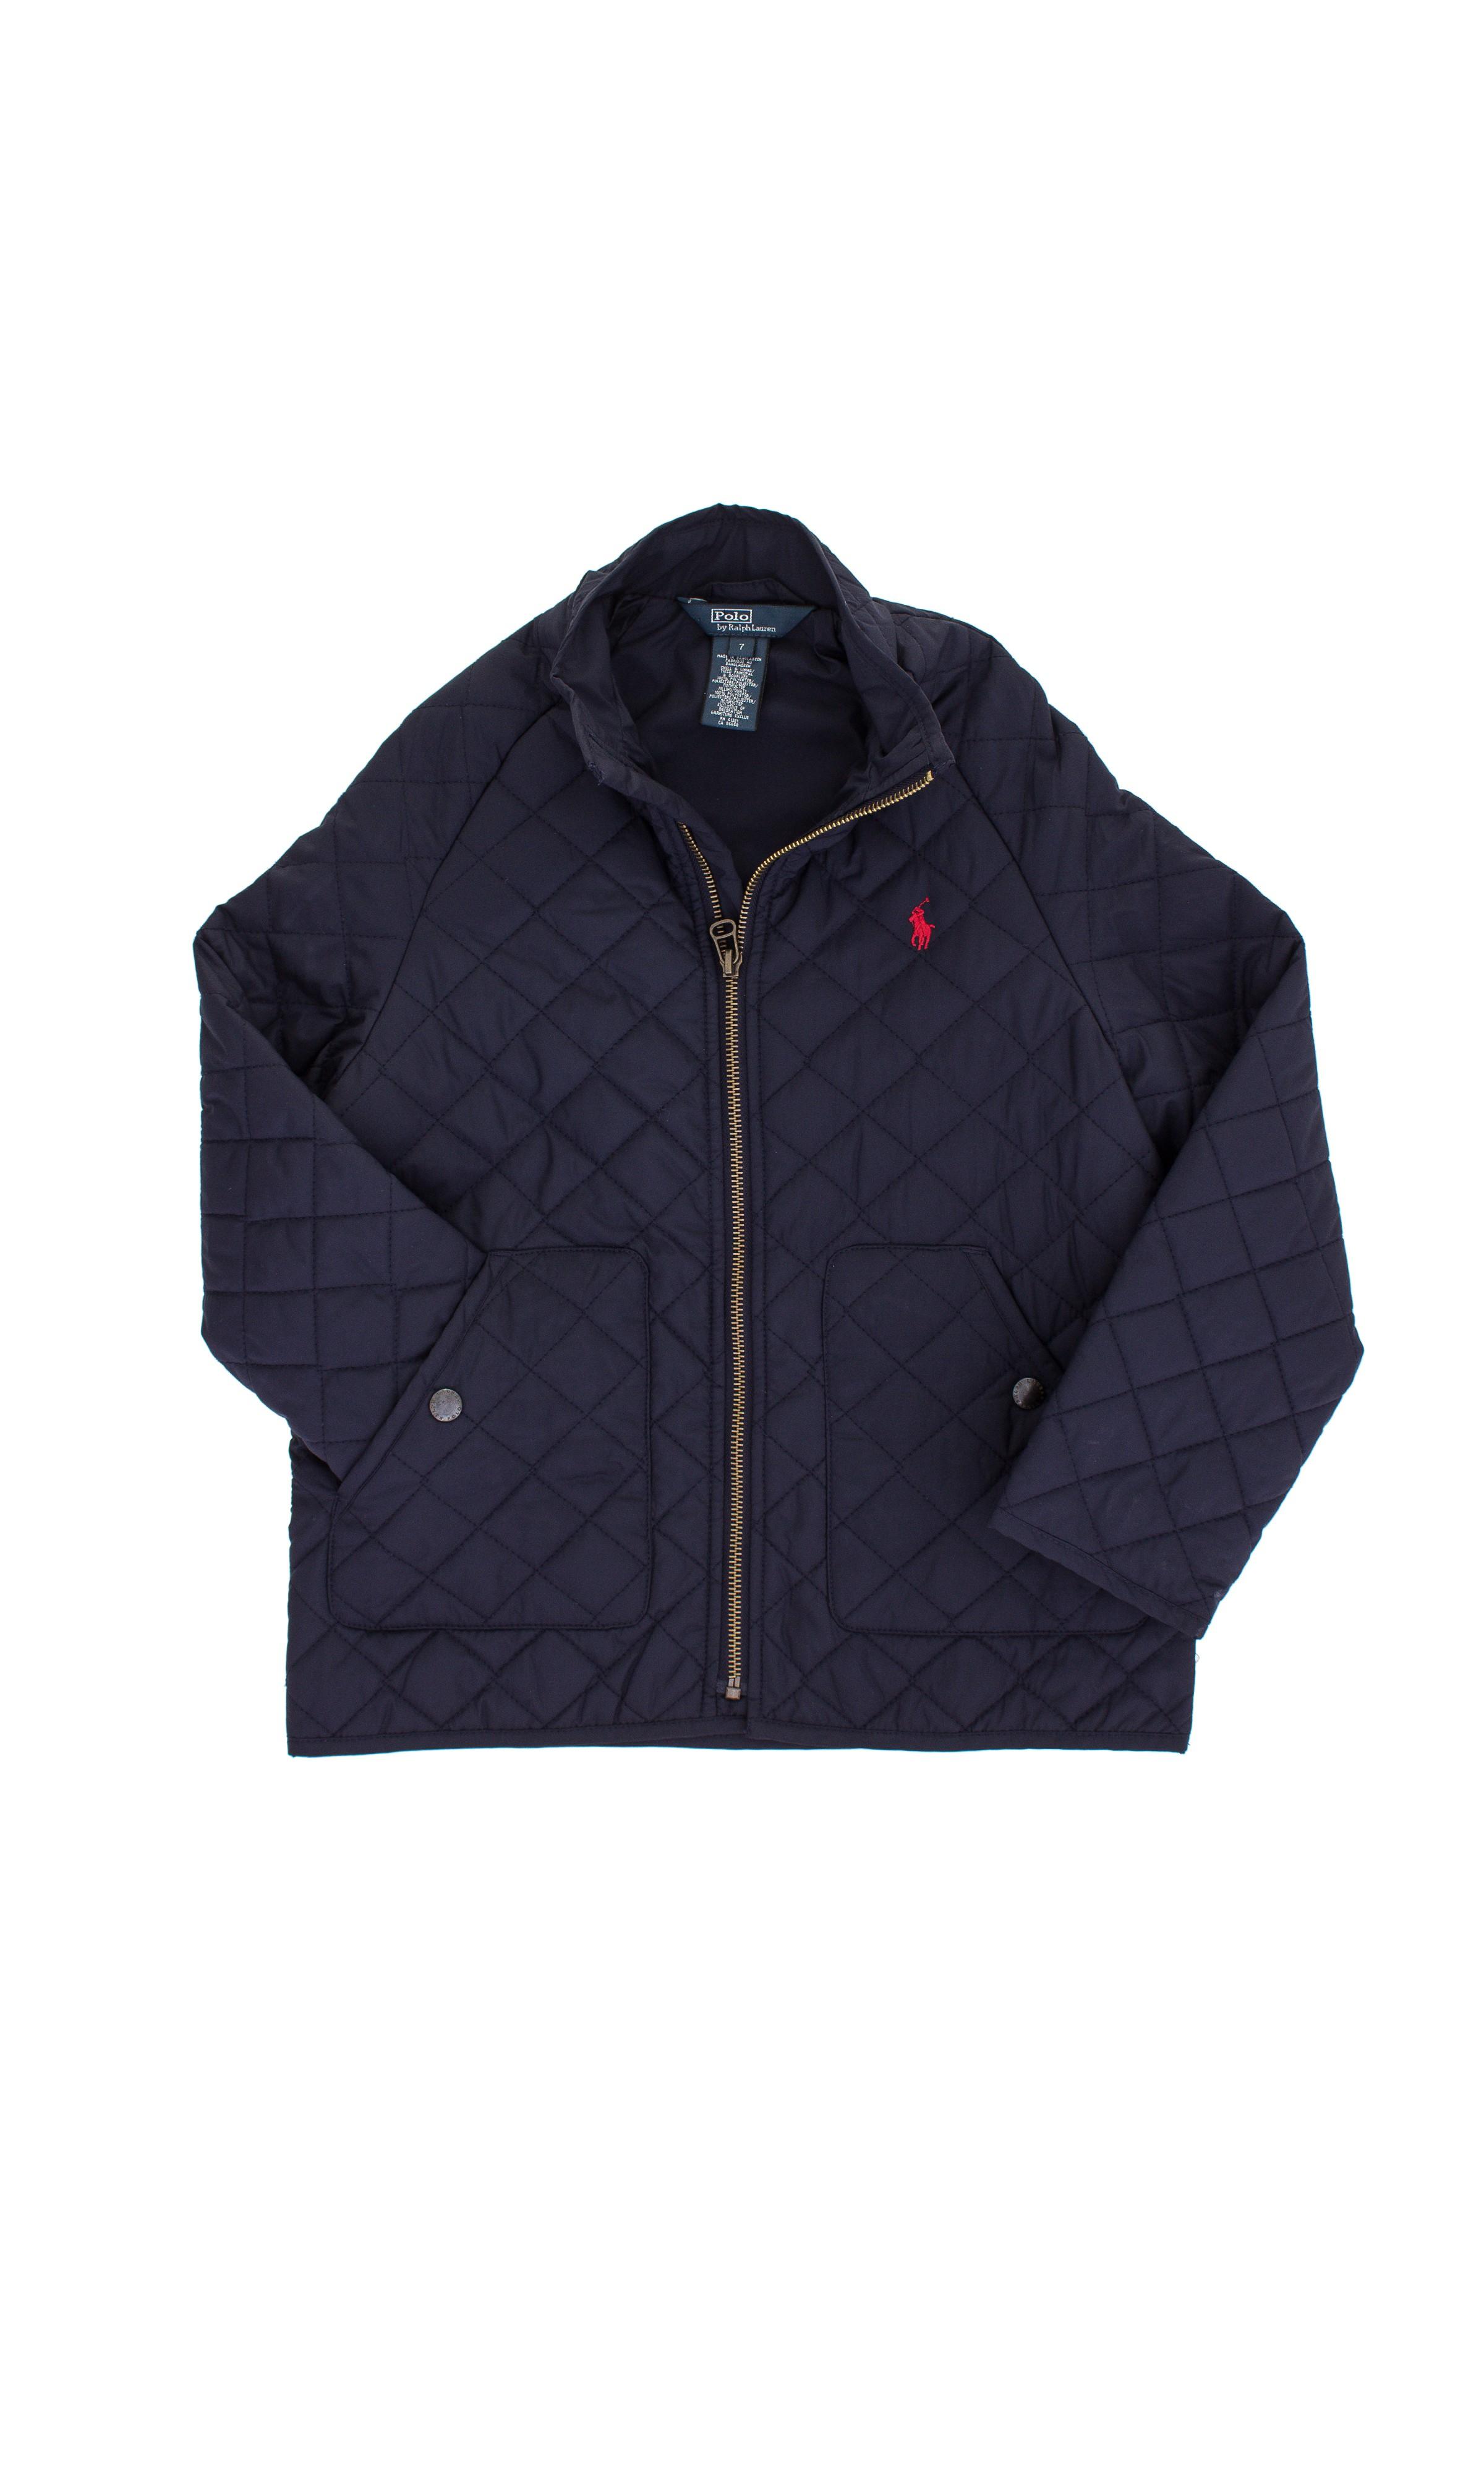 f63d70a5788c4 Pikowana kurtka granatowa Polo Ralph Lauren - Celebrity-Club